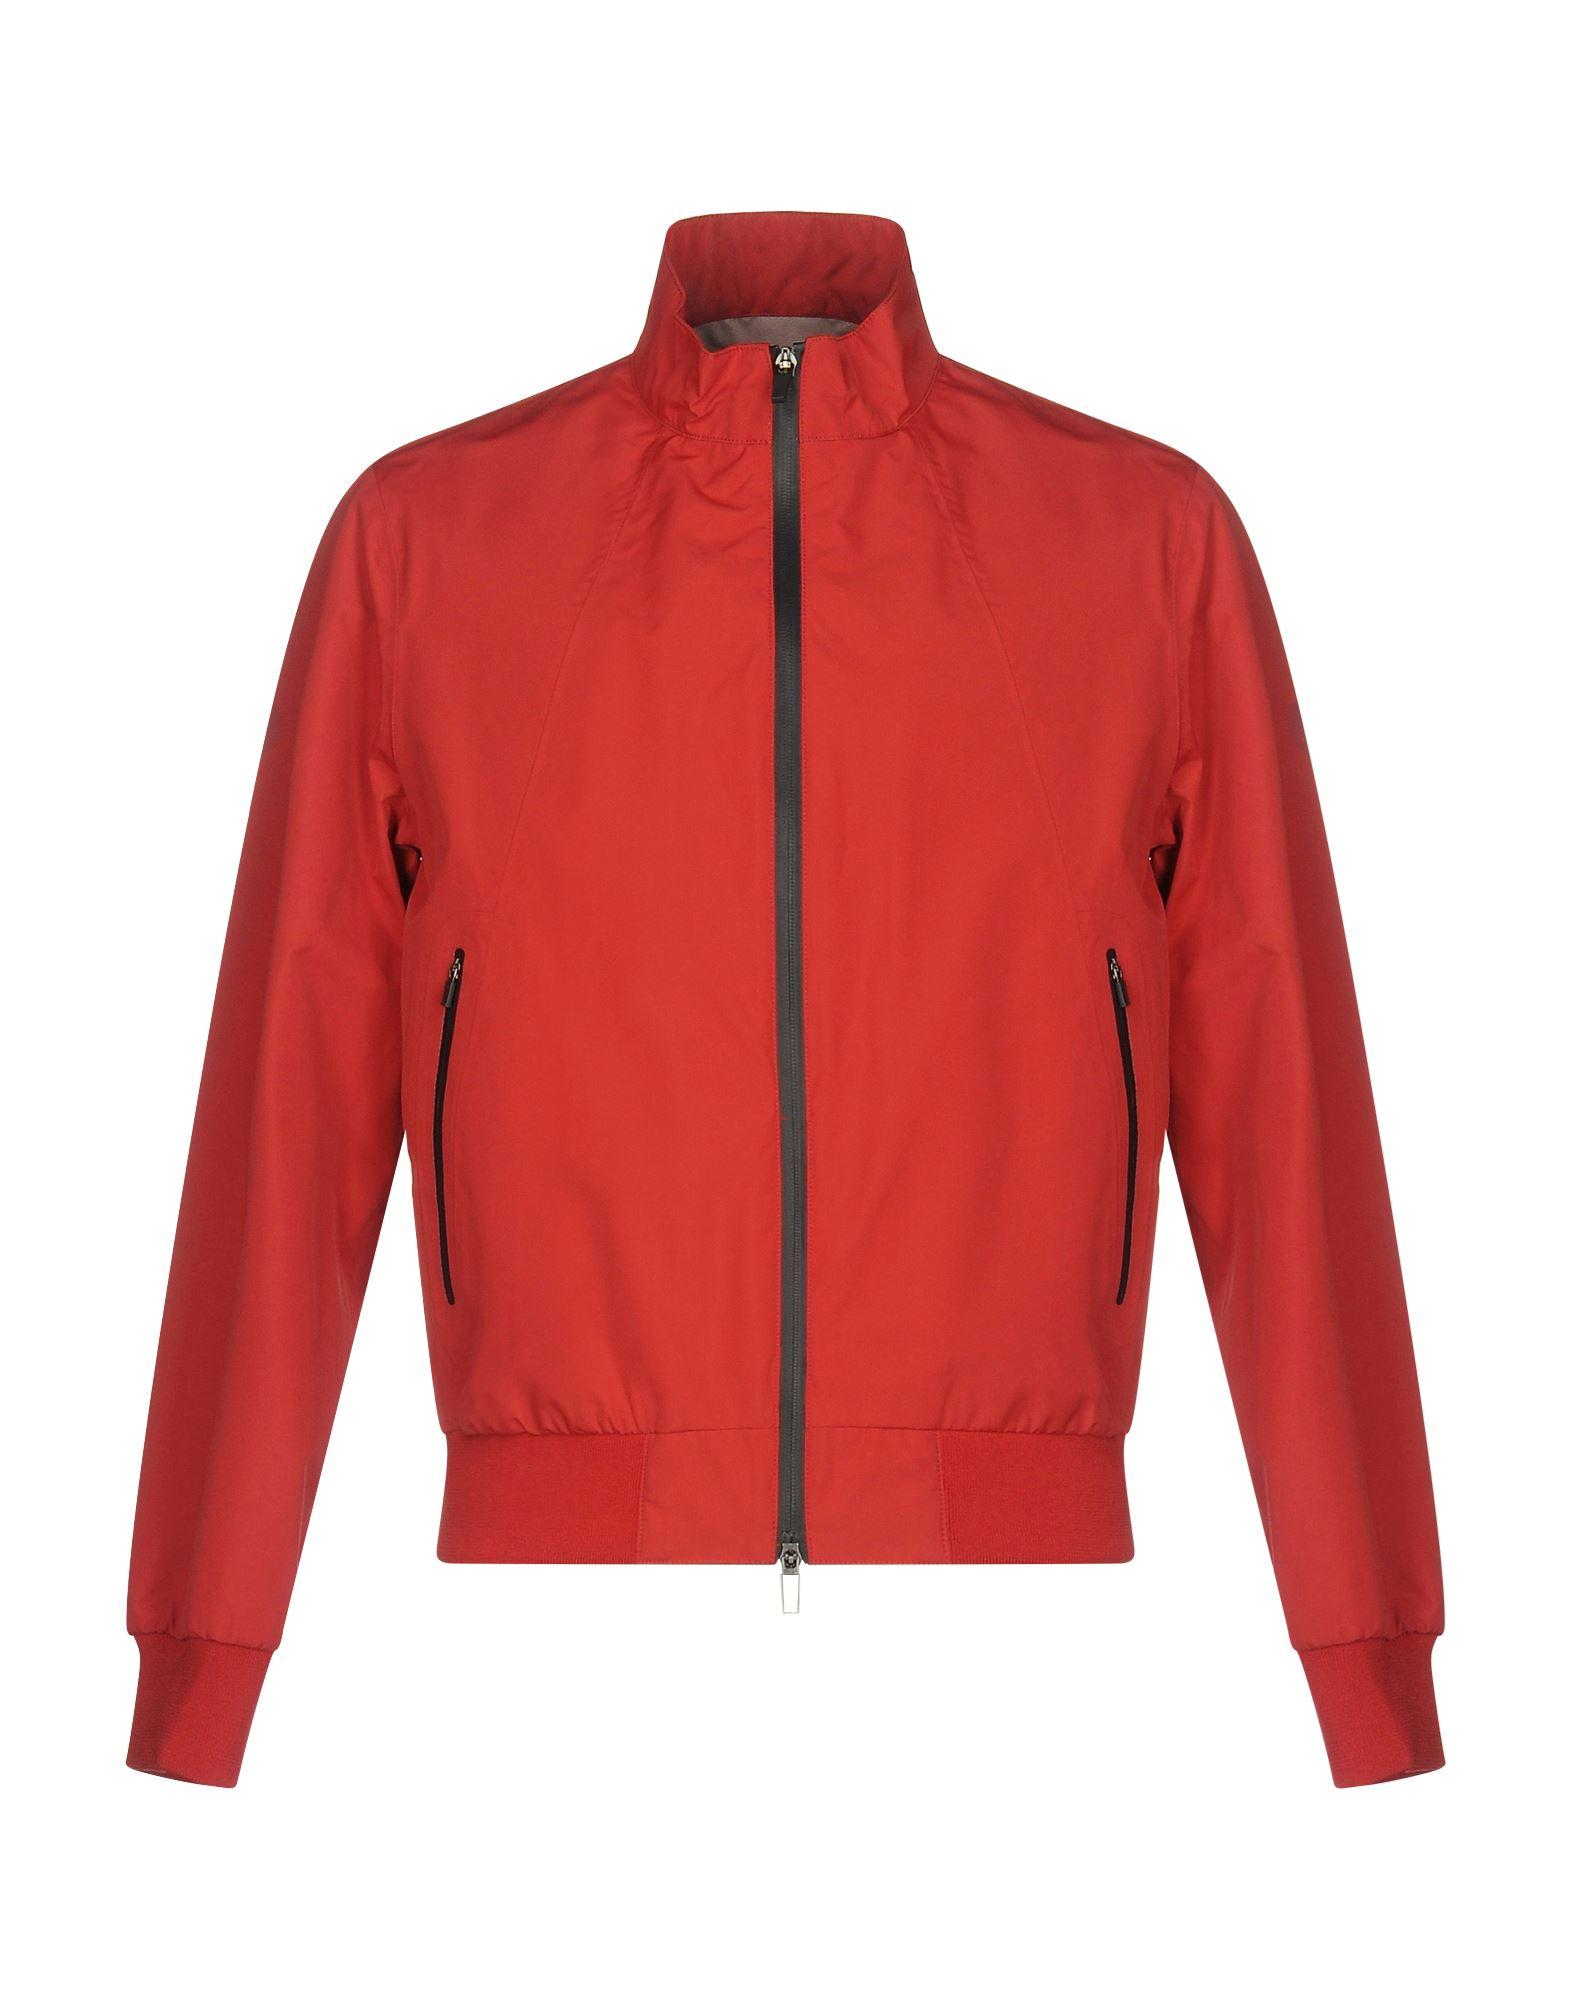 куртка для мальчика 18607 355 красный noble people PEOPLE OF SHIBUYA Куртка